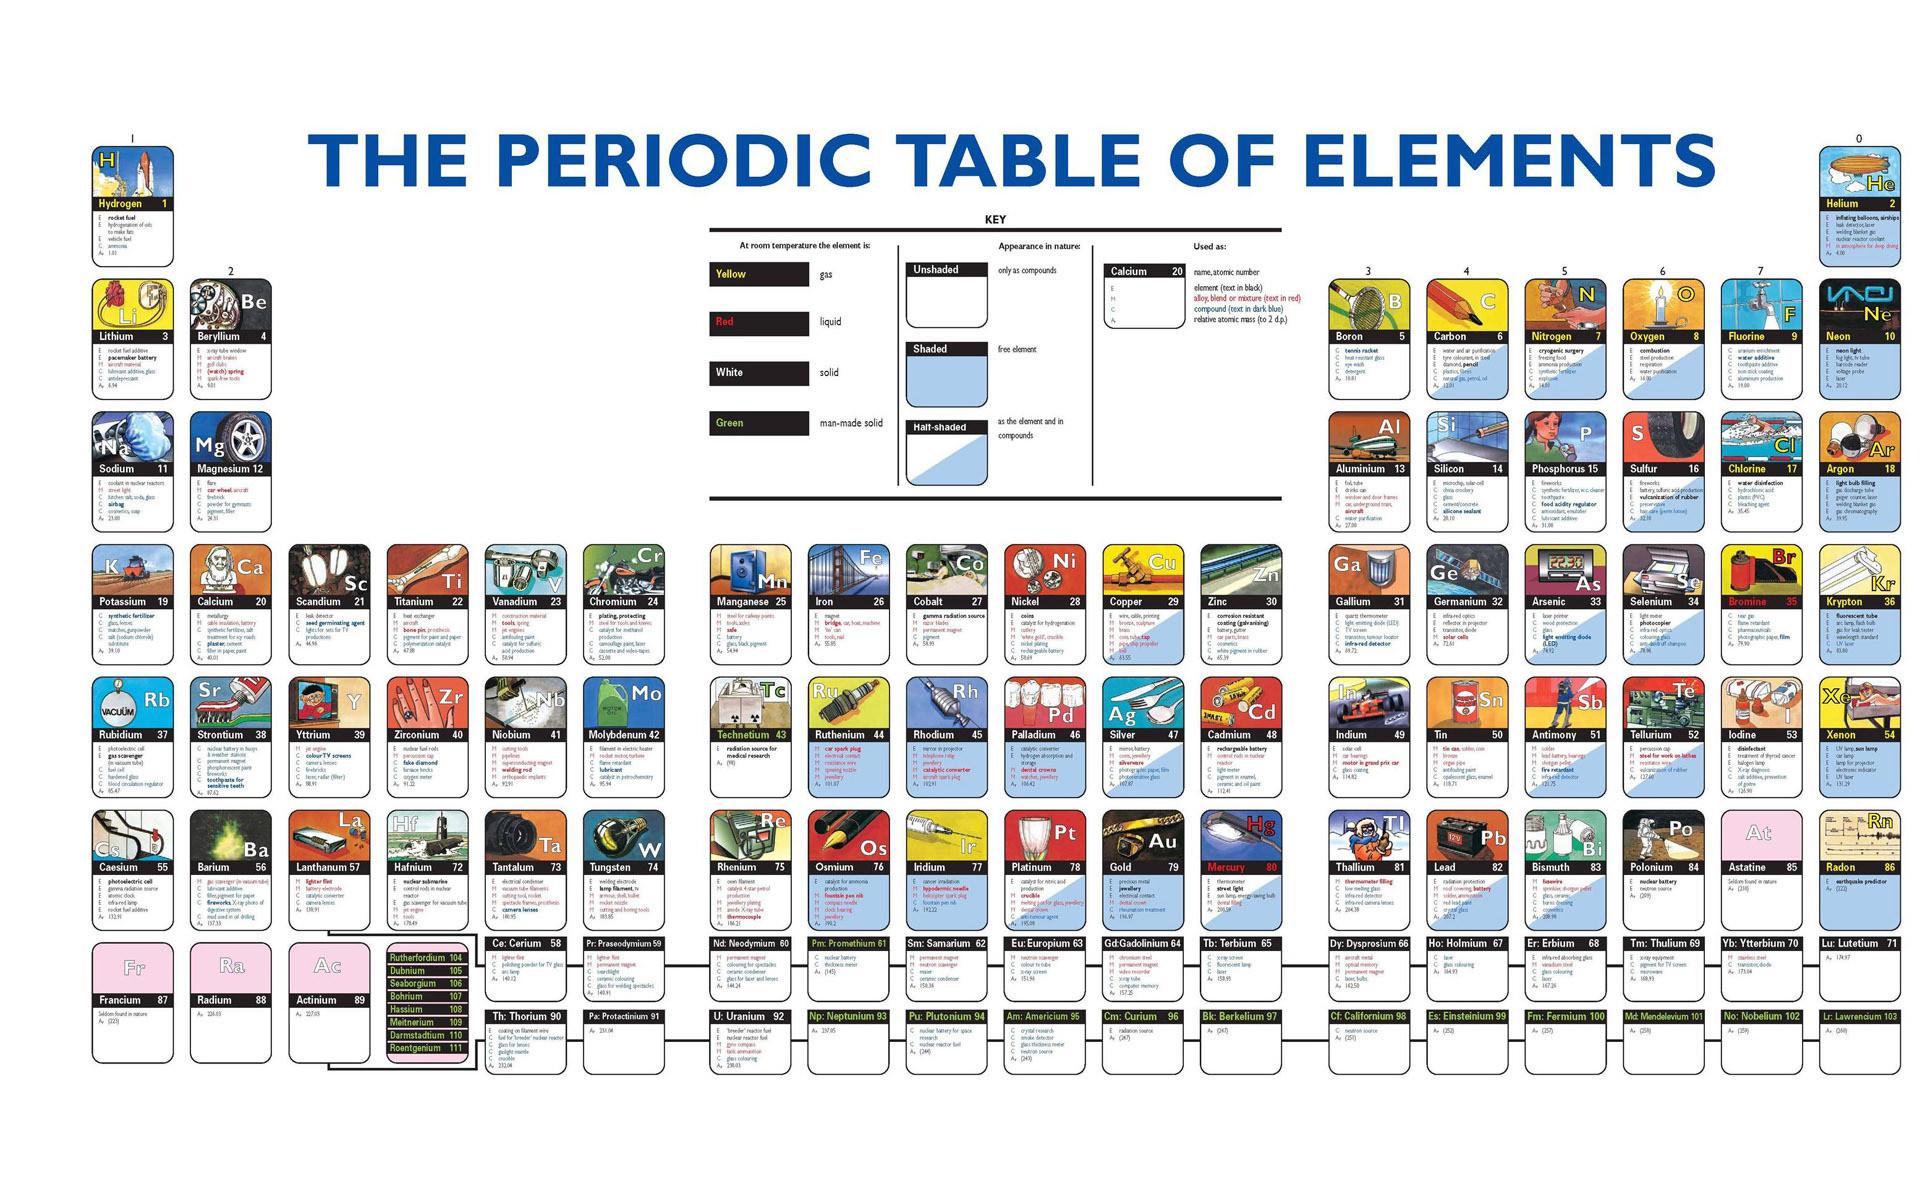 Tritium periodic table images periodic table images sargent welch periodic table choice image periodic table images tritium periodic table image collections periodic table gamestrikefo Images